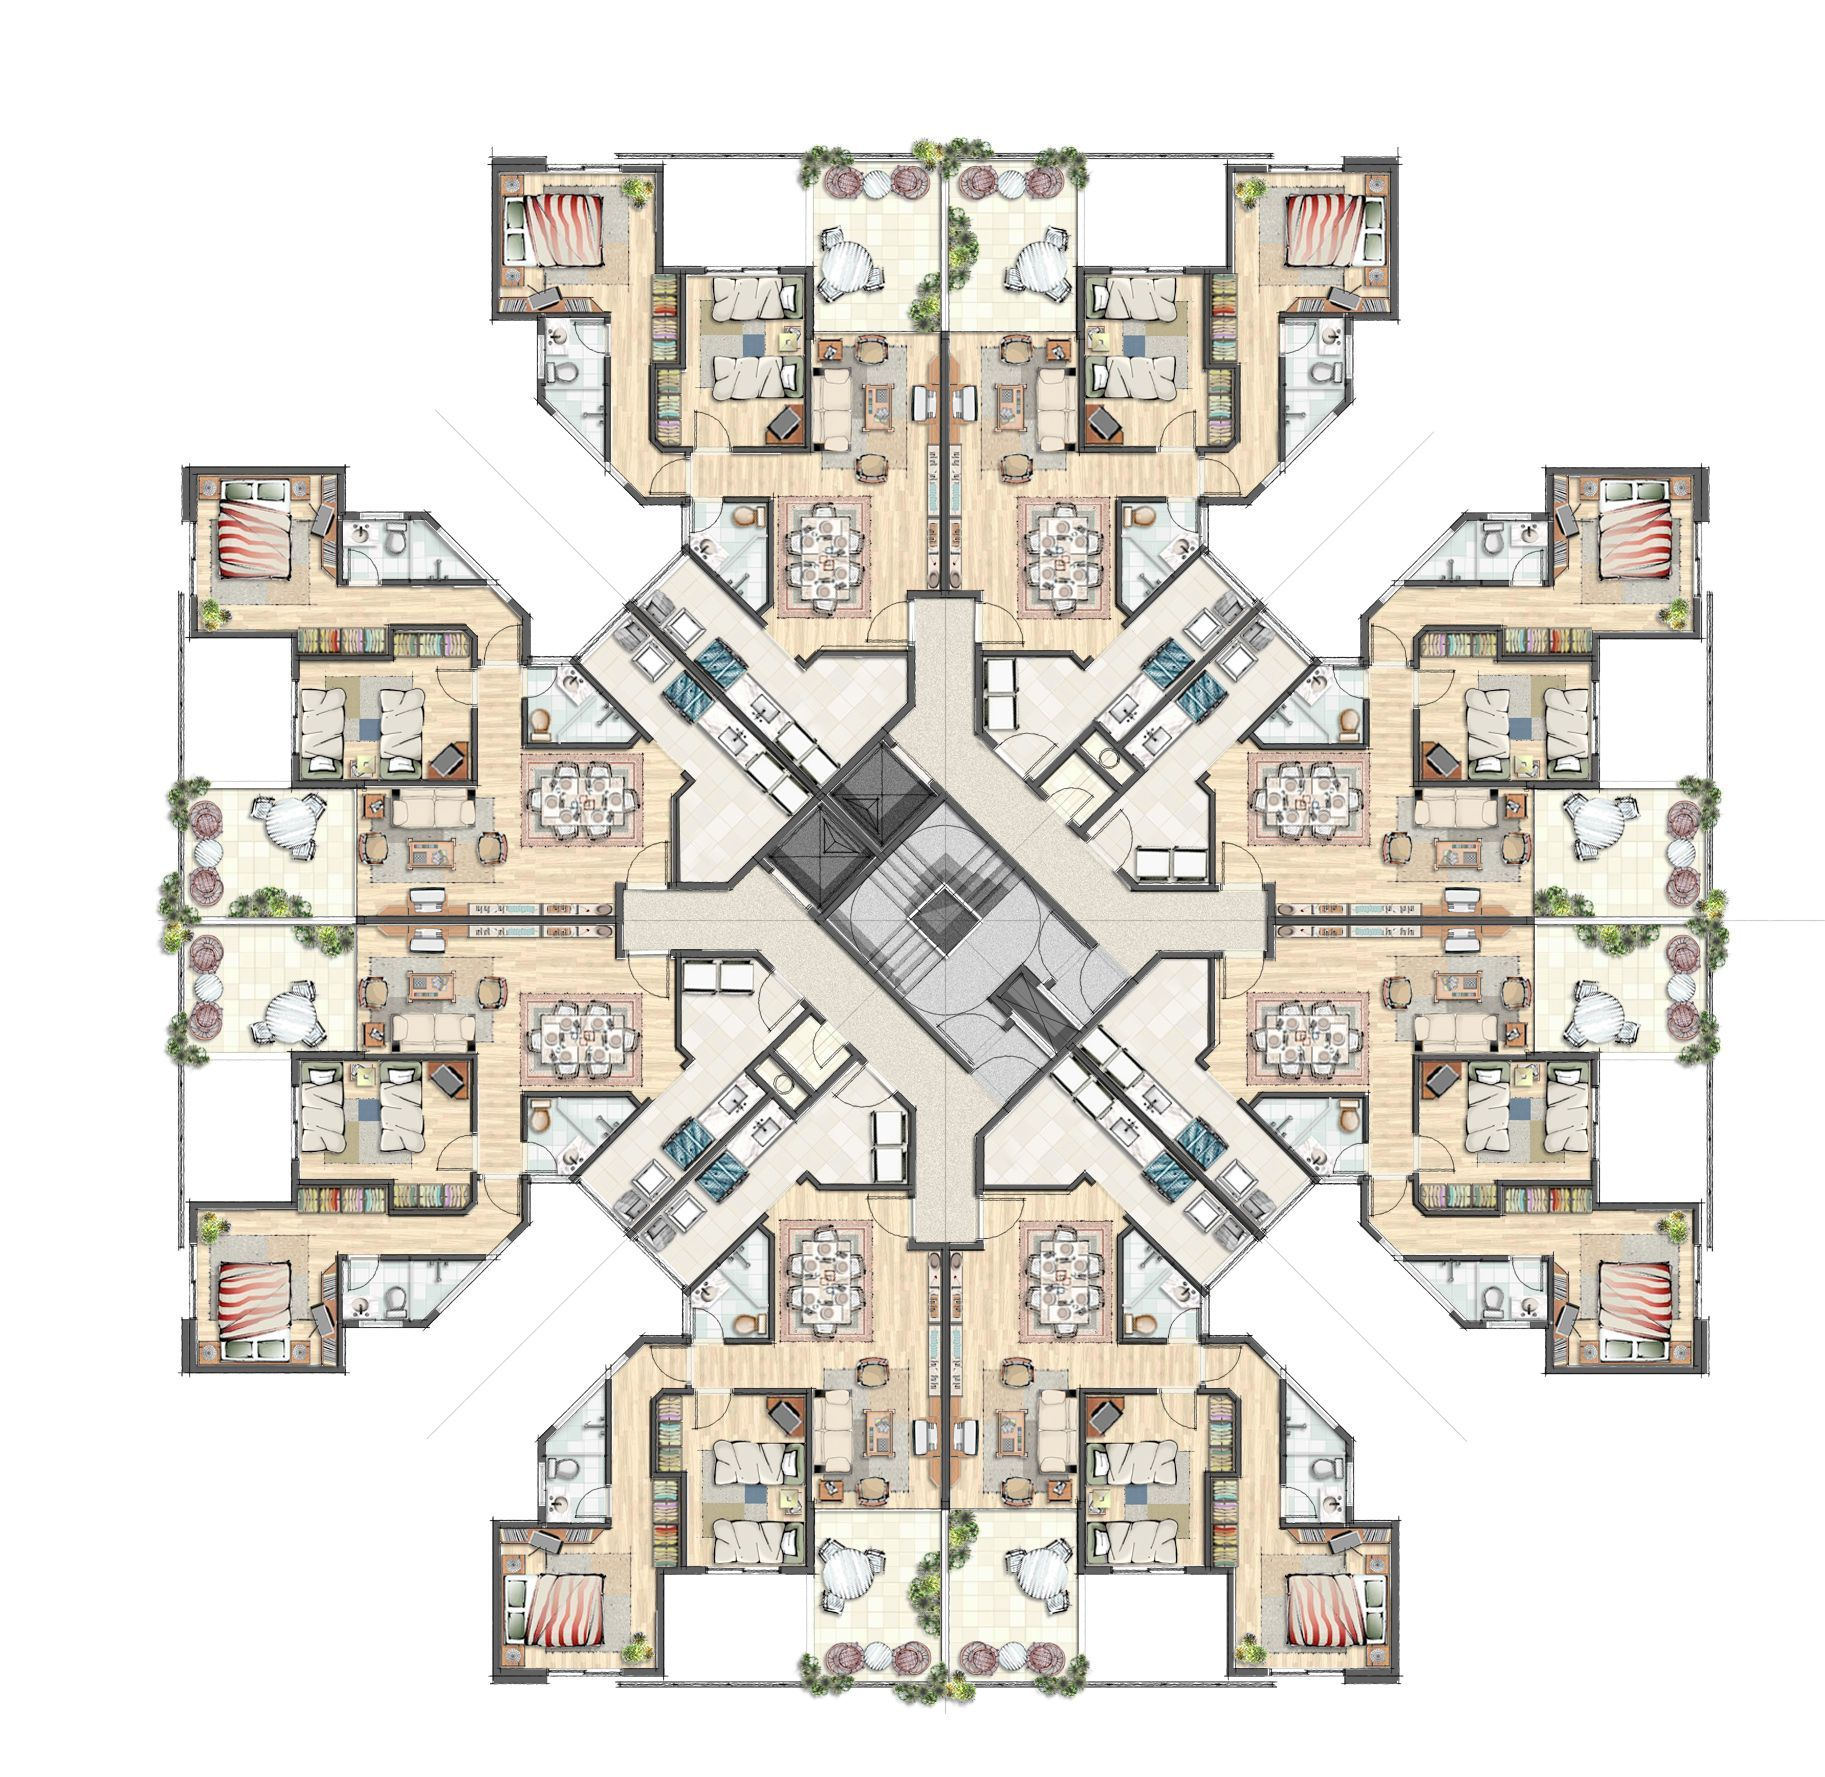 High Rise Apartment Building Floor Plans Residential